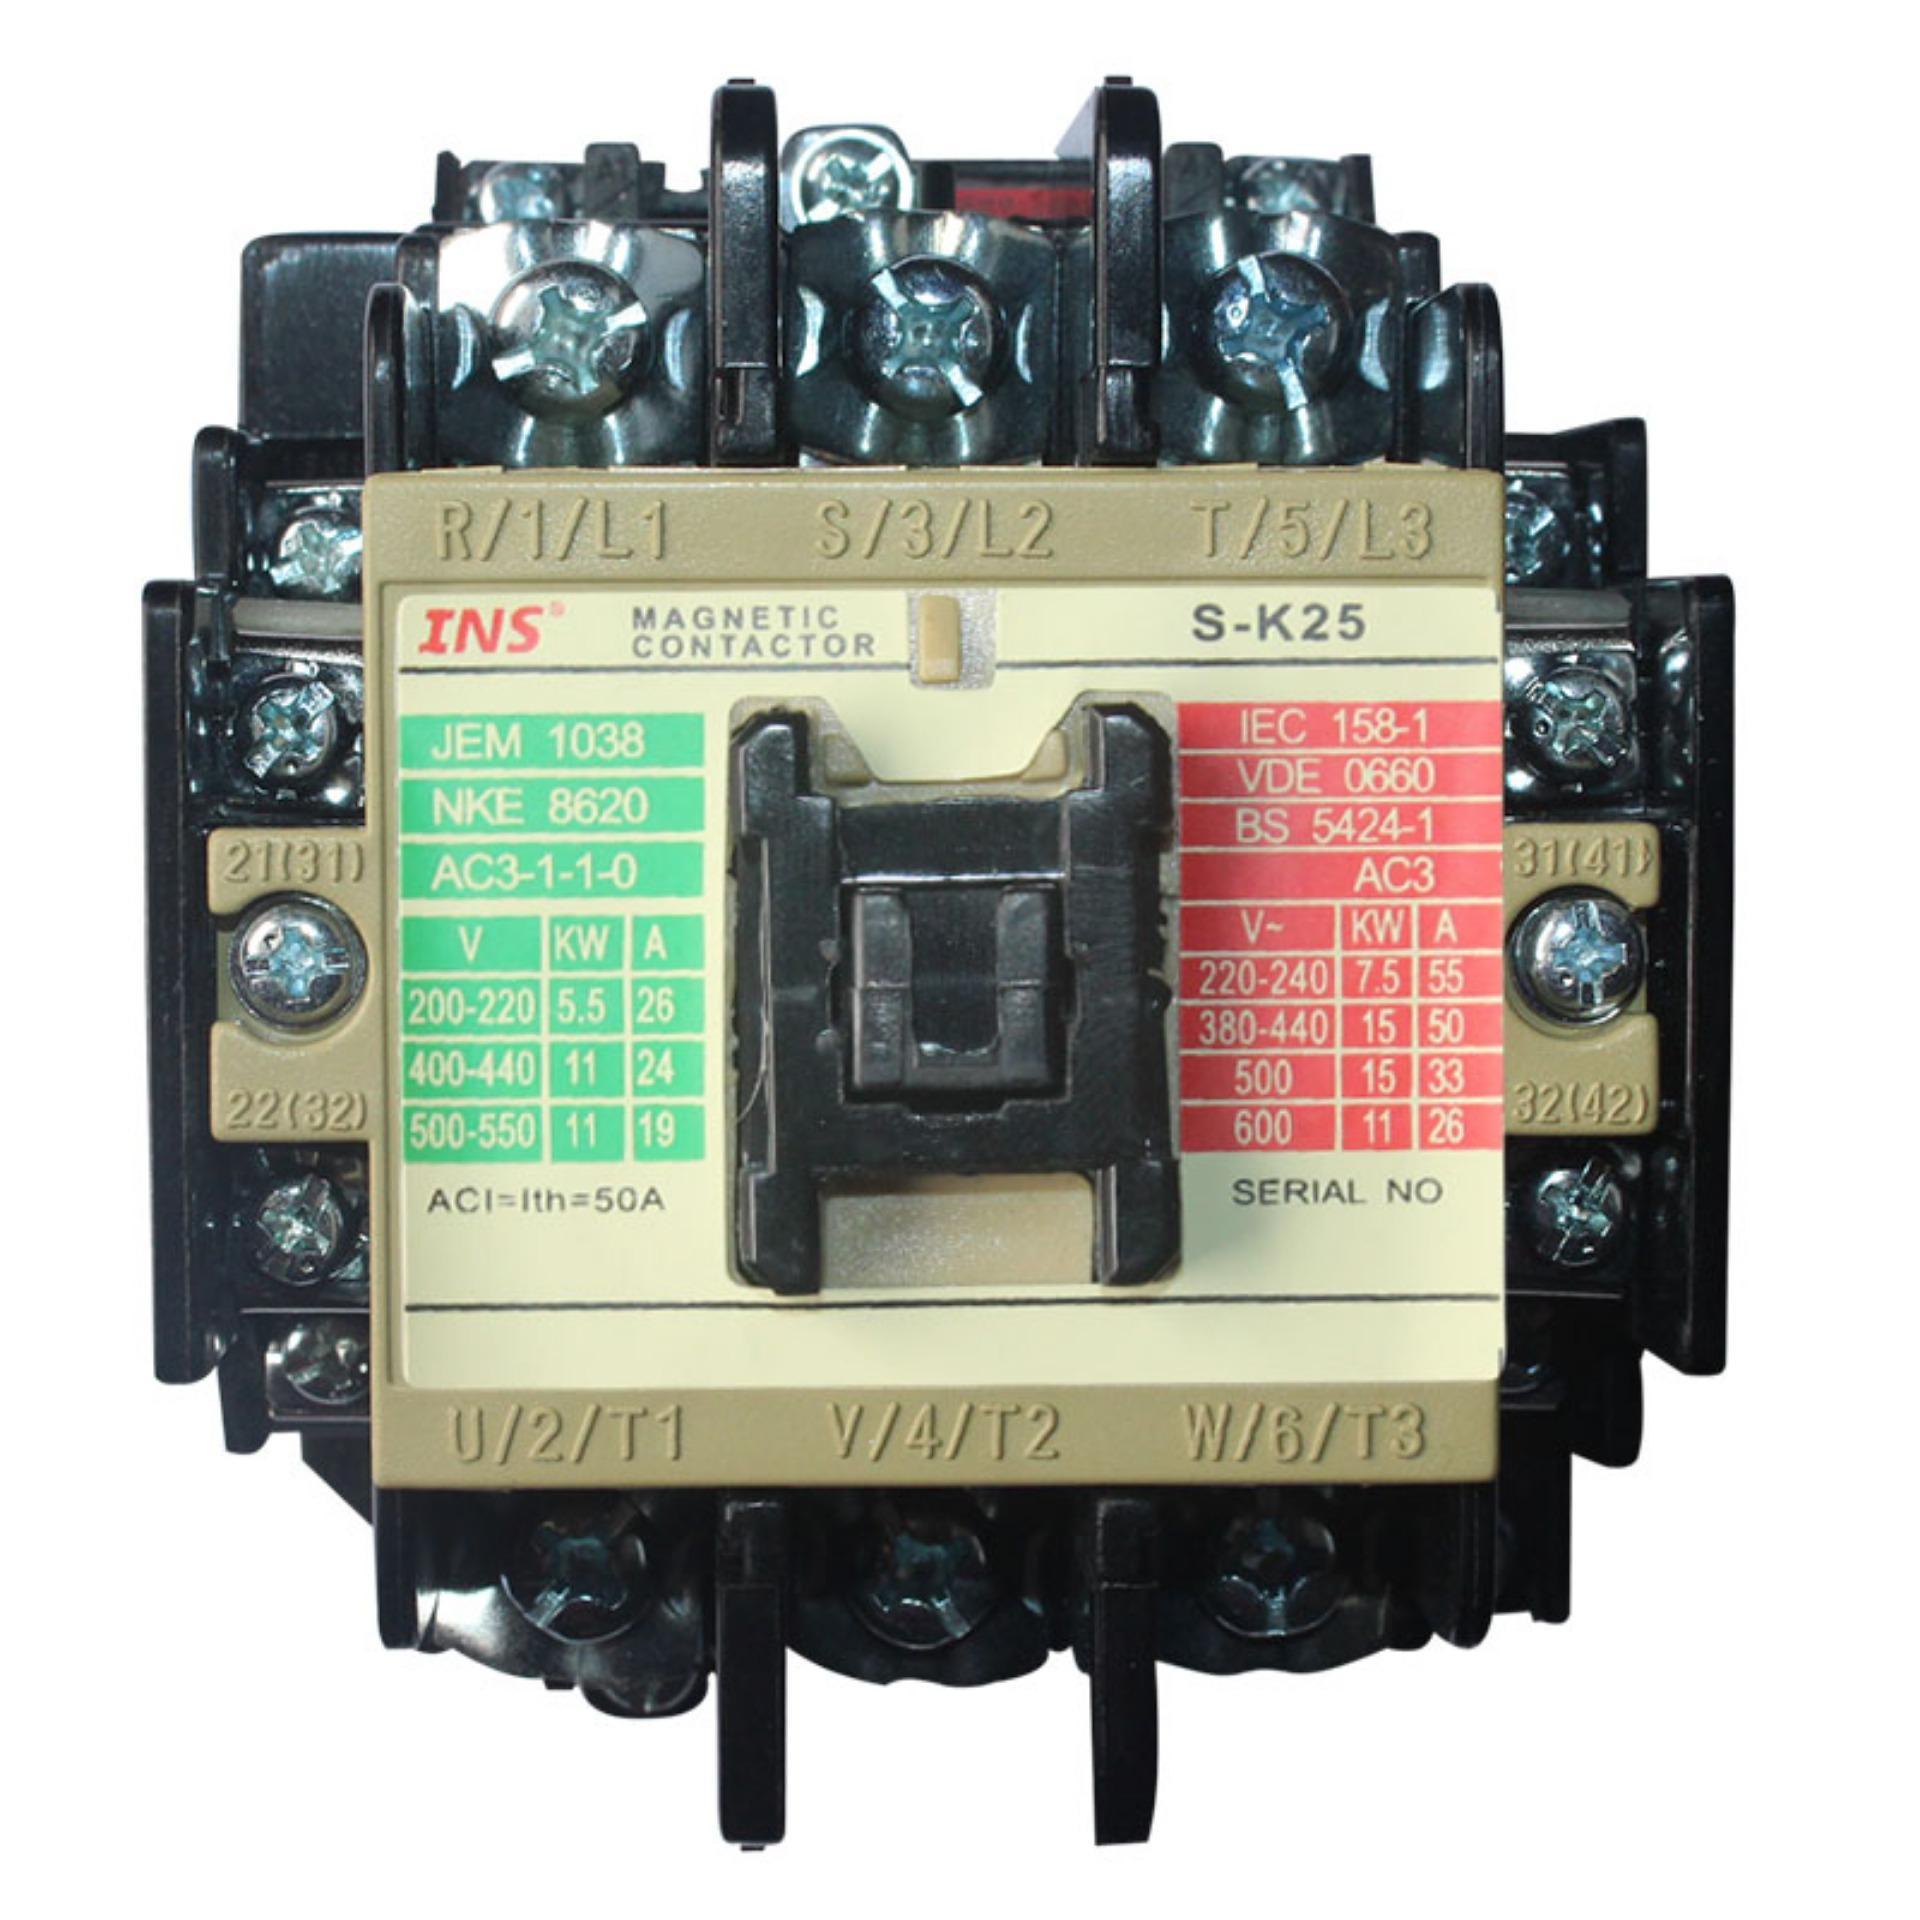 Diskon Besareelic Com Sk25 Contactor Ac Magnetic 3P Ac 50A 220V 380V 440V 50 60 Hz Coil